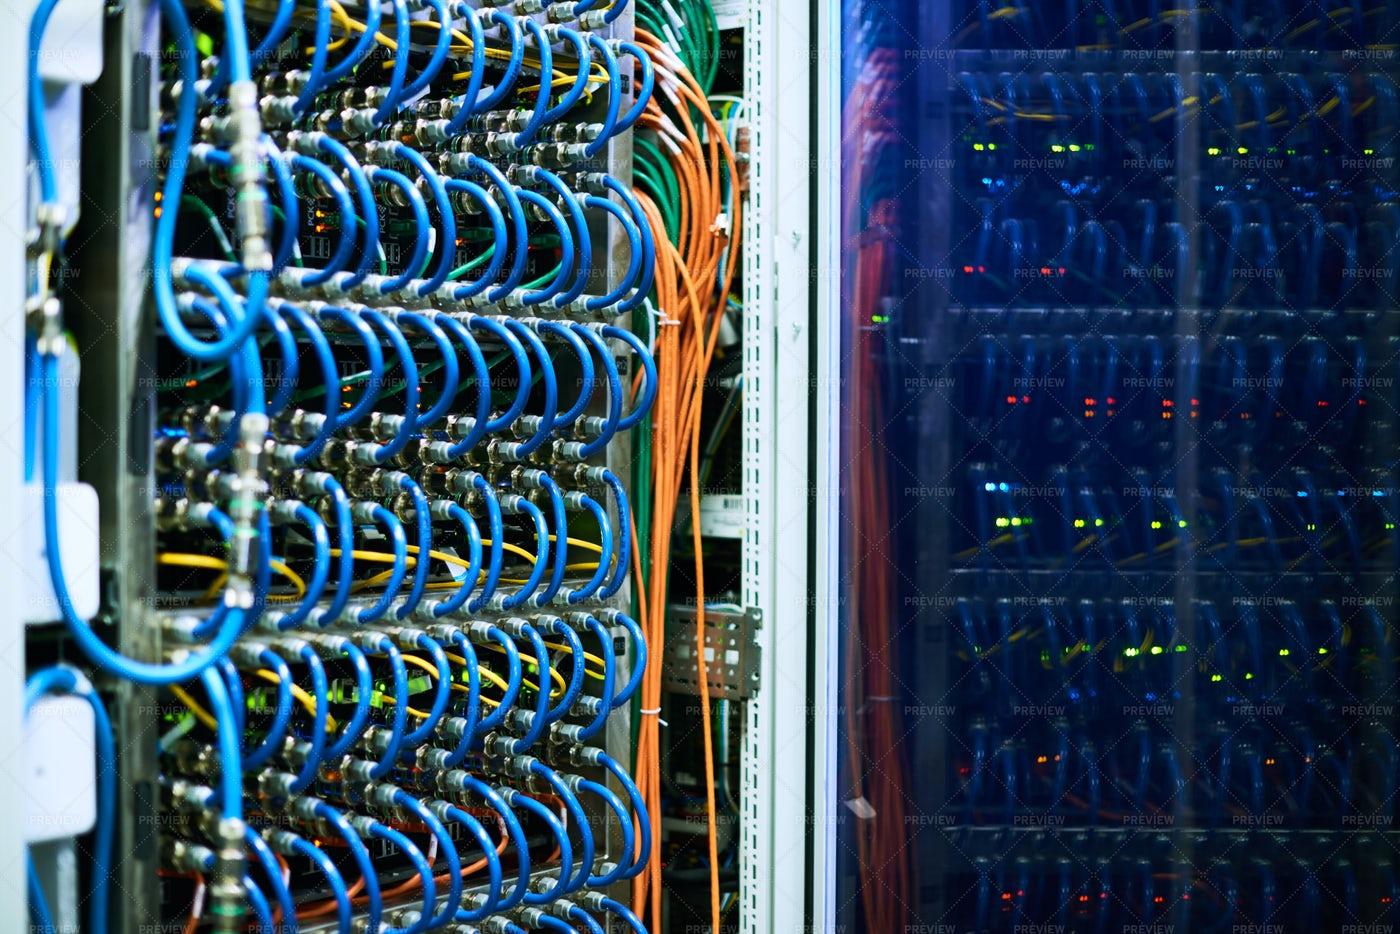 Supercomputer Server: Stock Photos